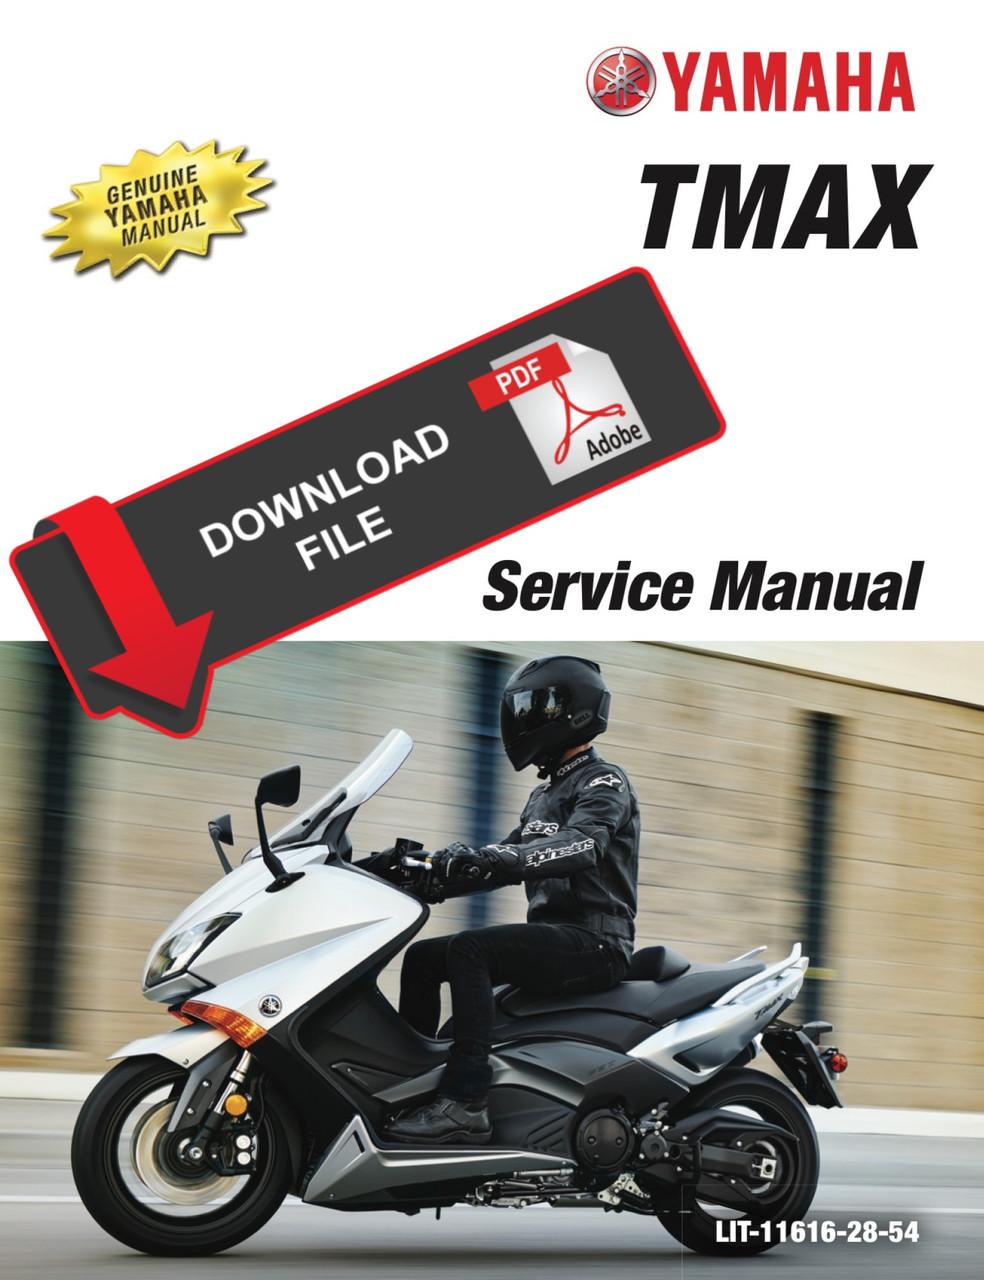 Yamaha 2016 Tmax 530 Service Manual